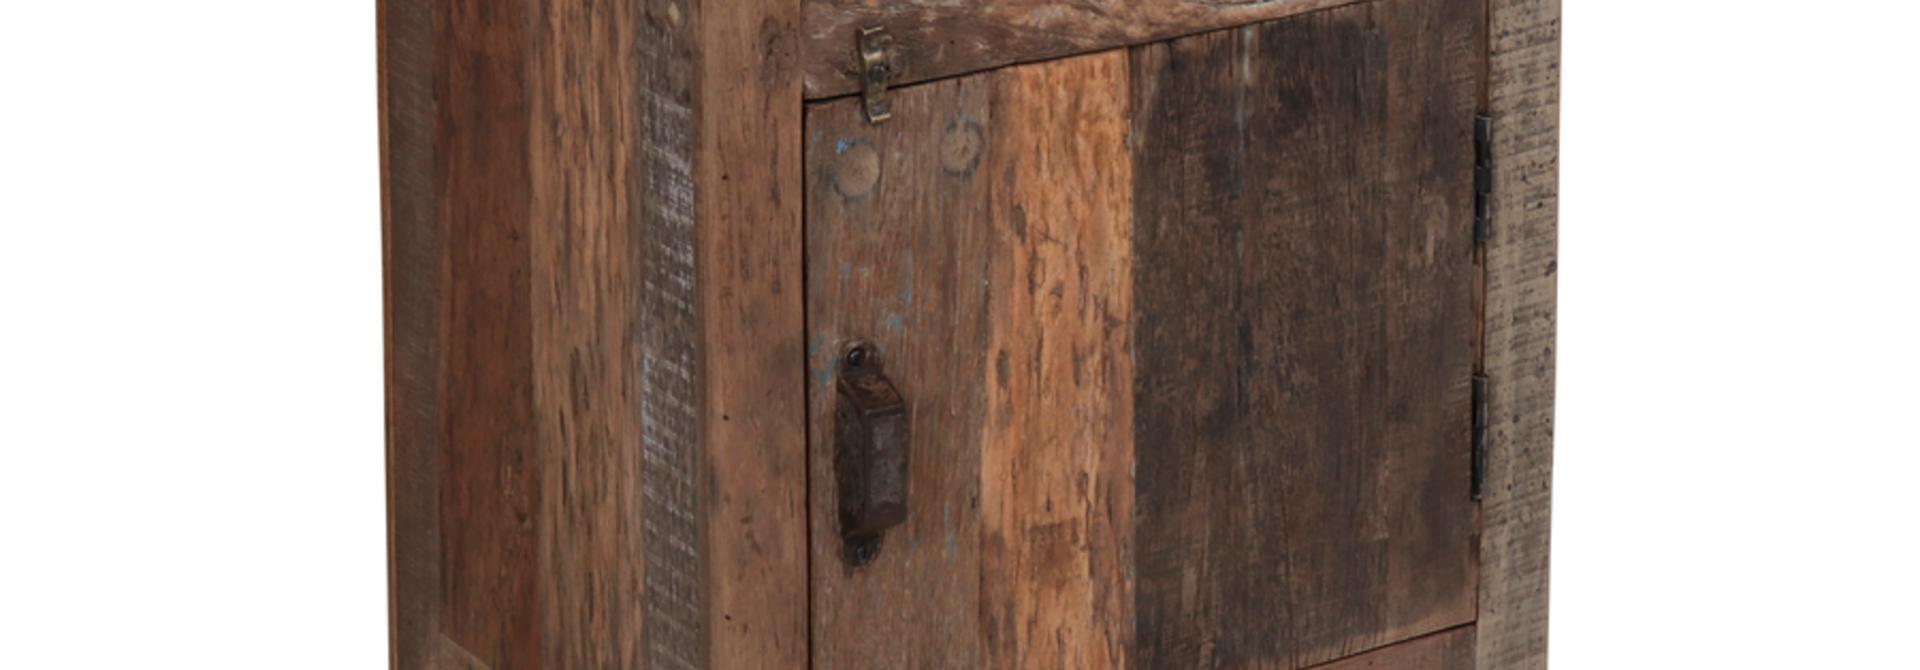 Houten nachtkastje 1 deur/1 lade 50x35x70 cm